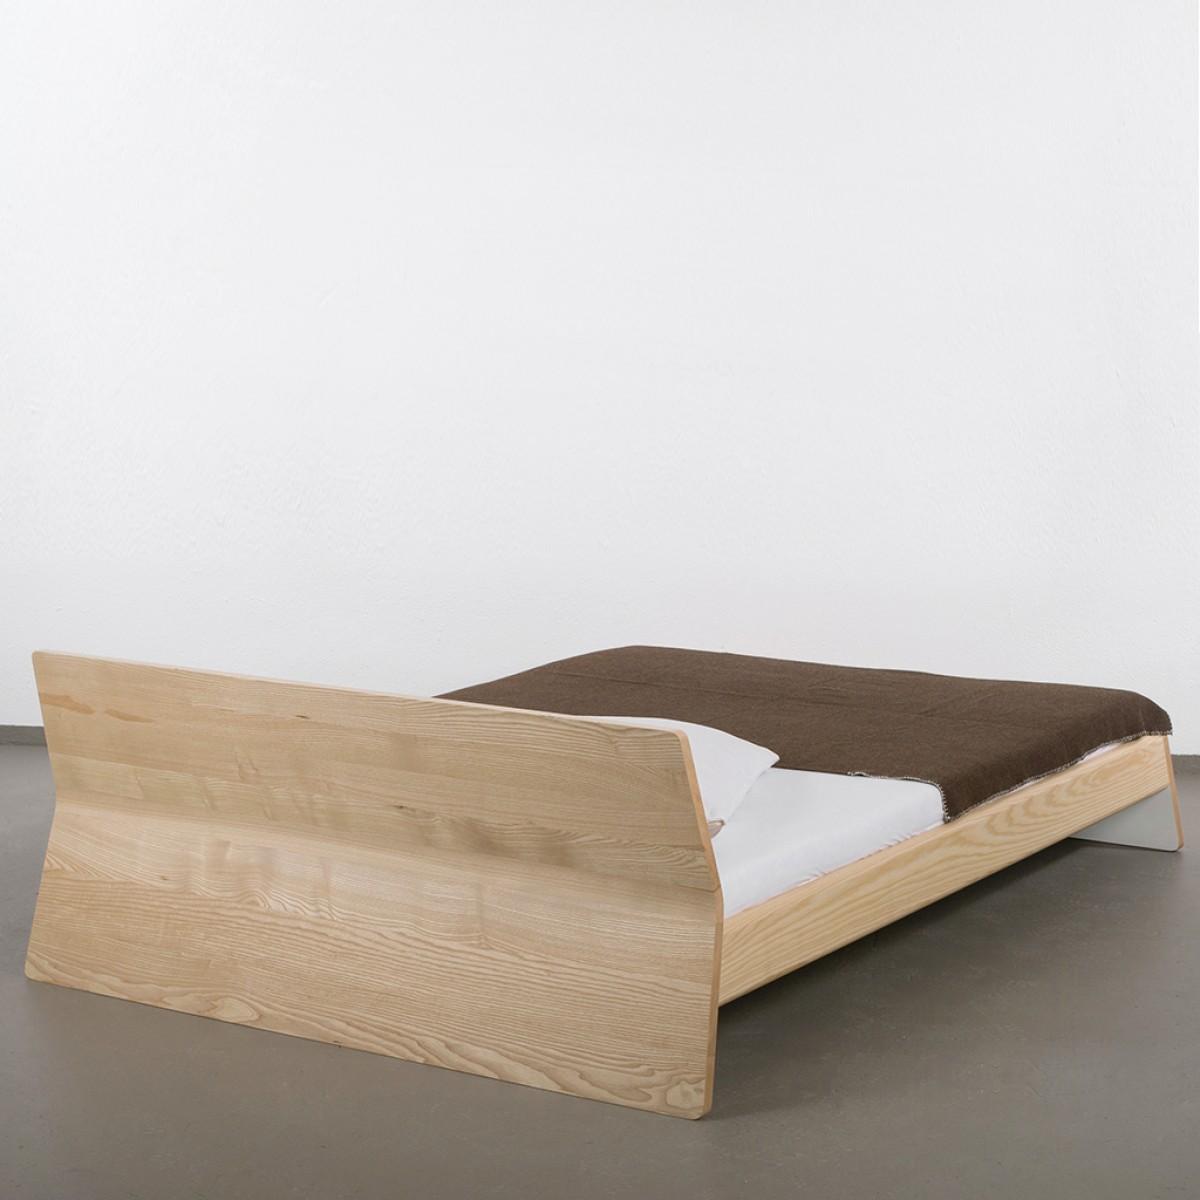 ellenbergerdesign Private Space Bett 140 x 200